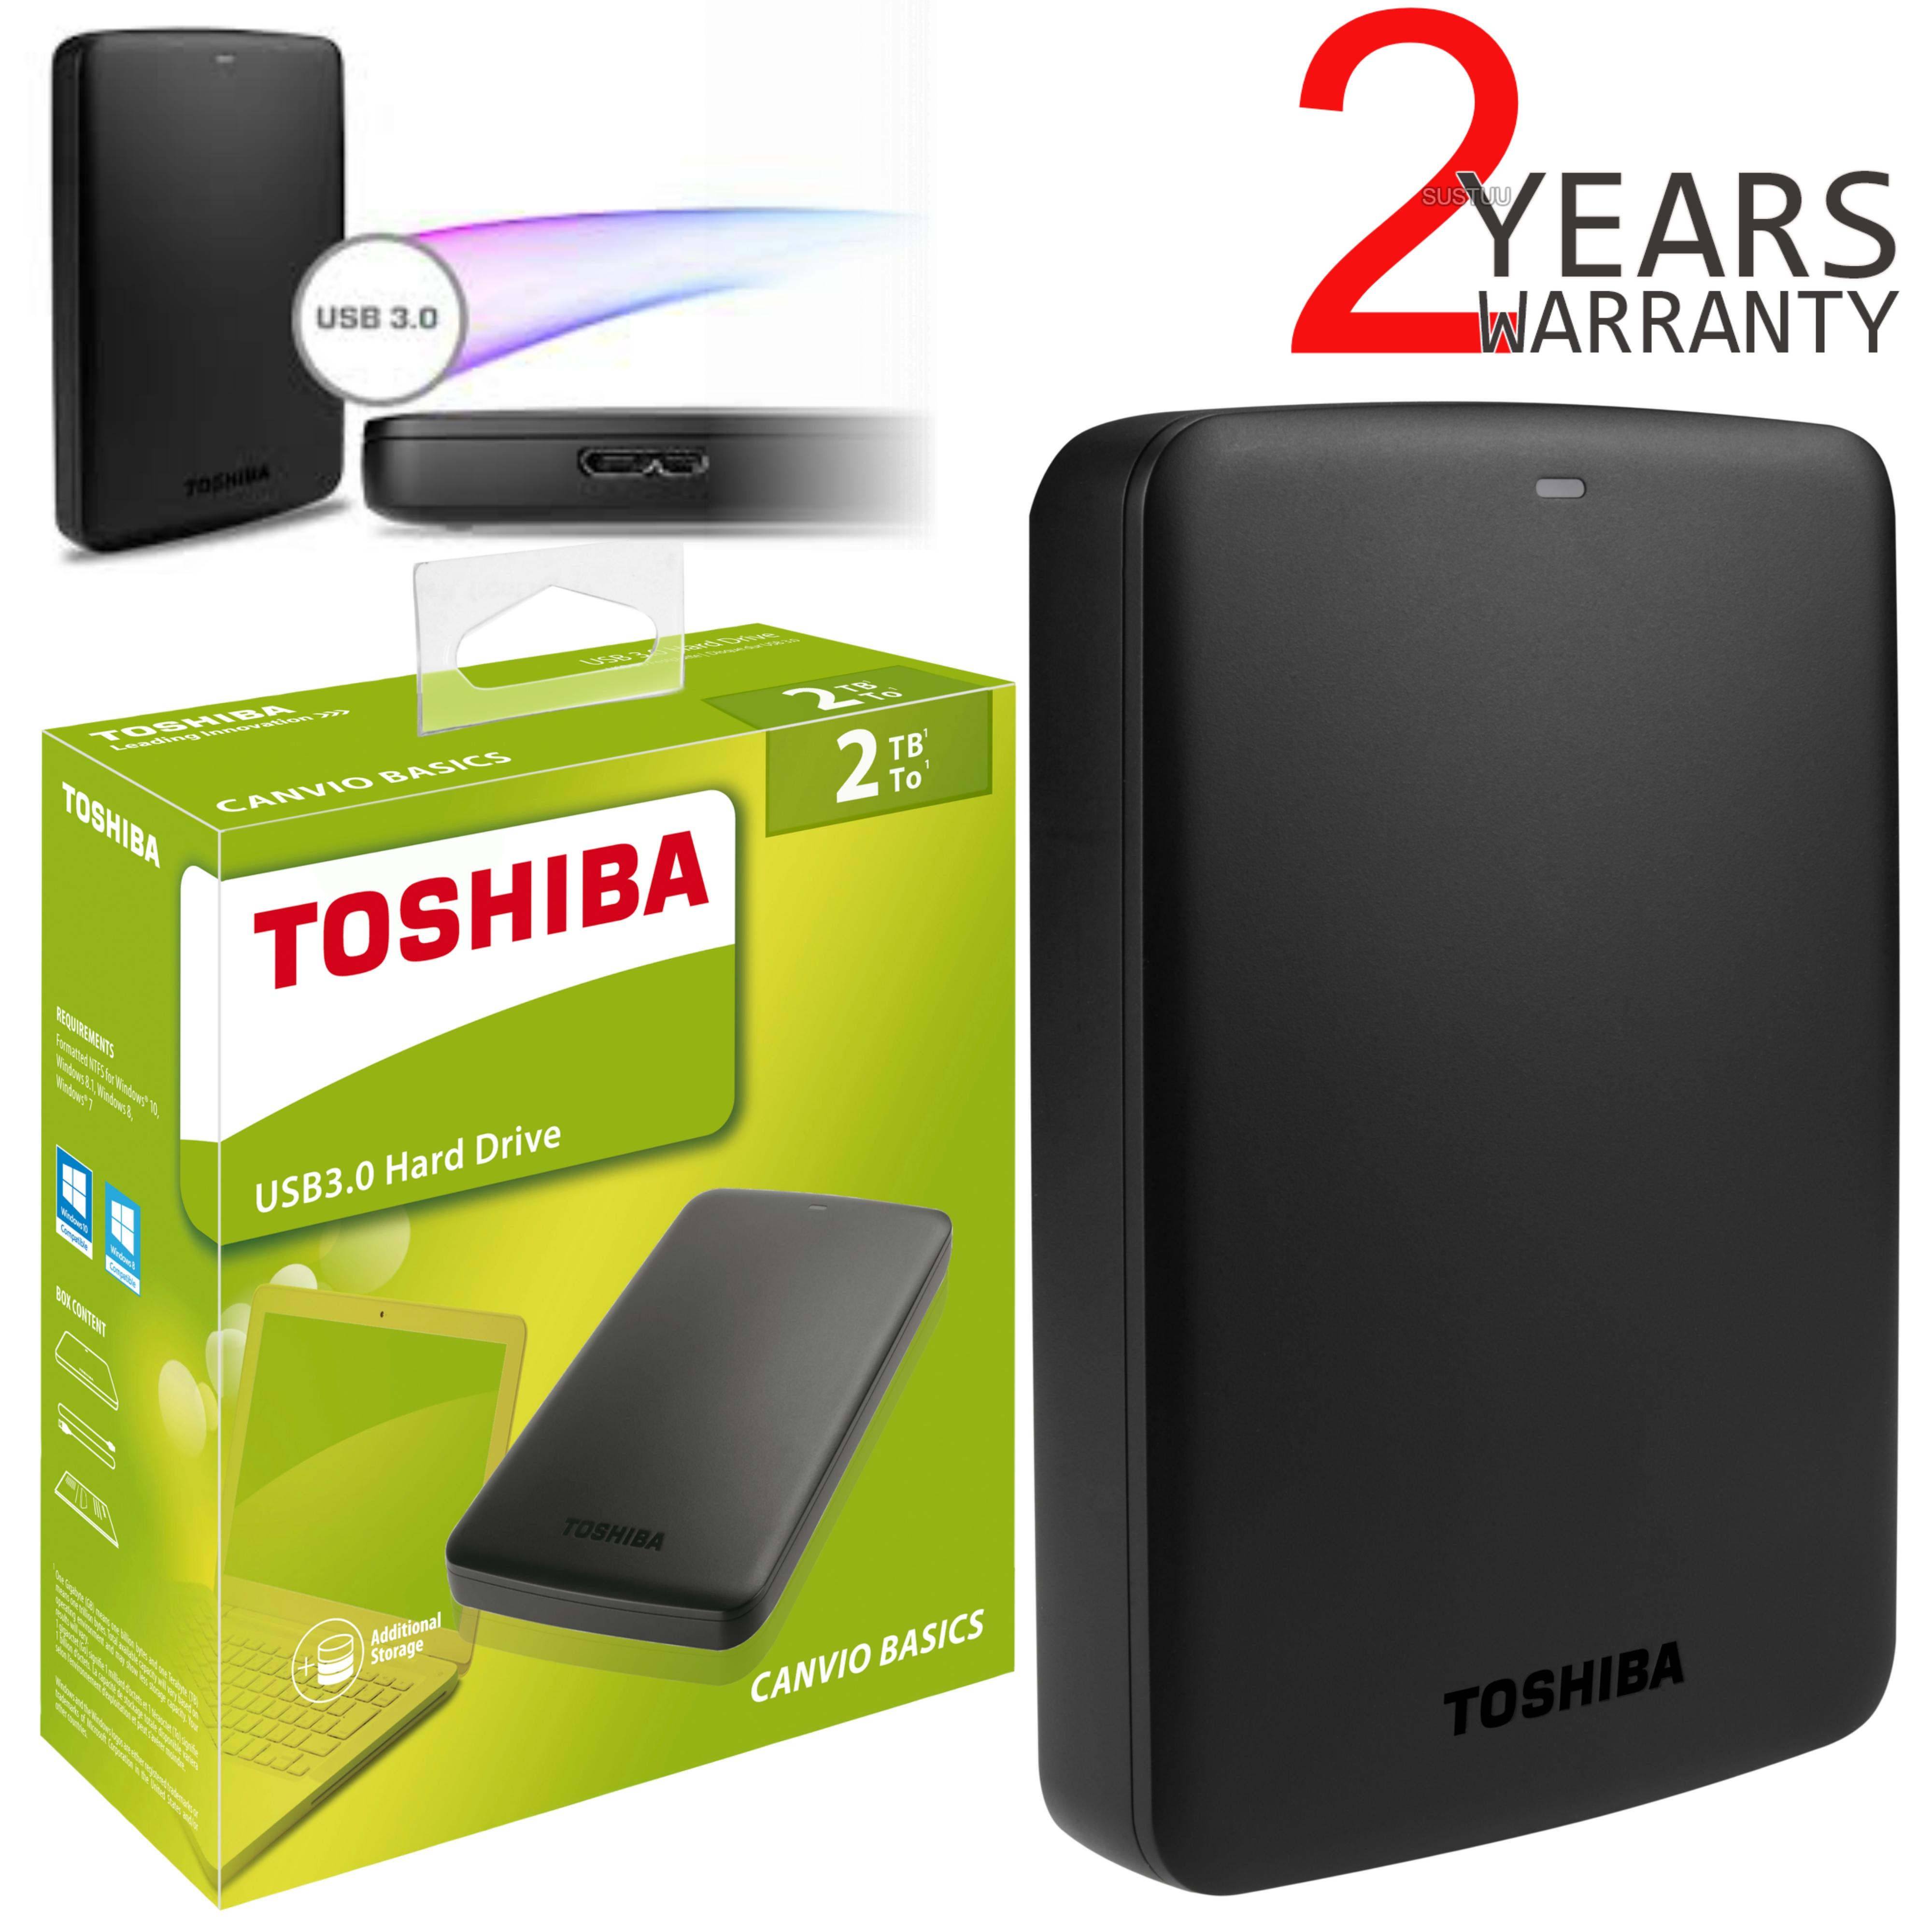 3ba50e7585a4 Toshiba 2TB External Hard Drive|Canvio Basics Portable|High Speed USB 3.0|2.5